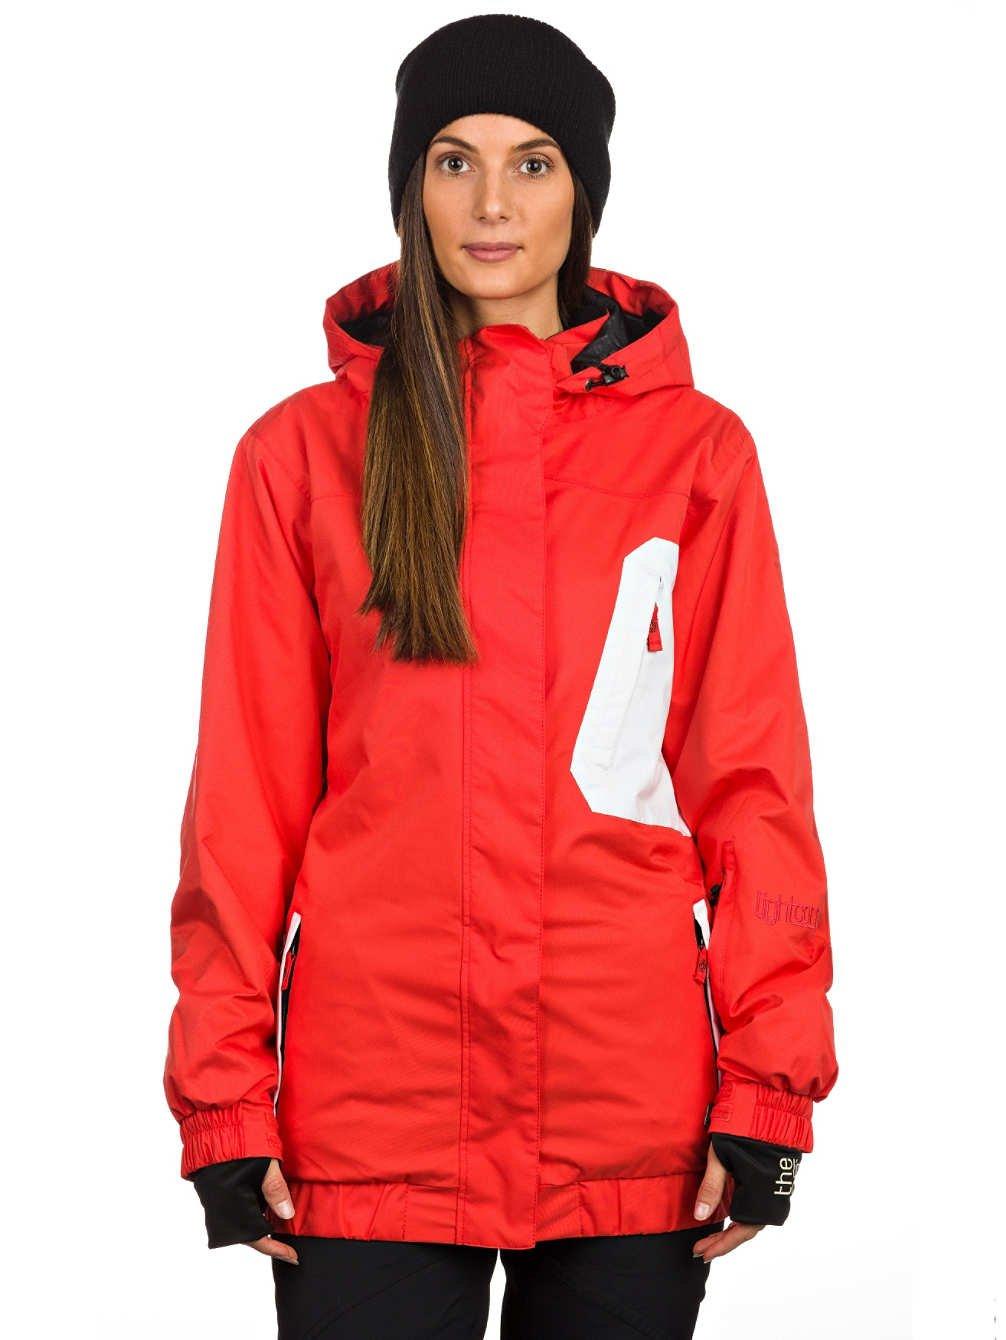 Damen Snowboard Jacke Light Bebop Jacket günstig bestellen